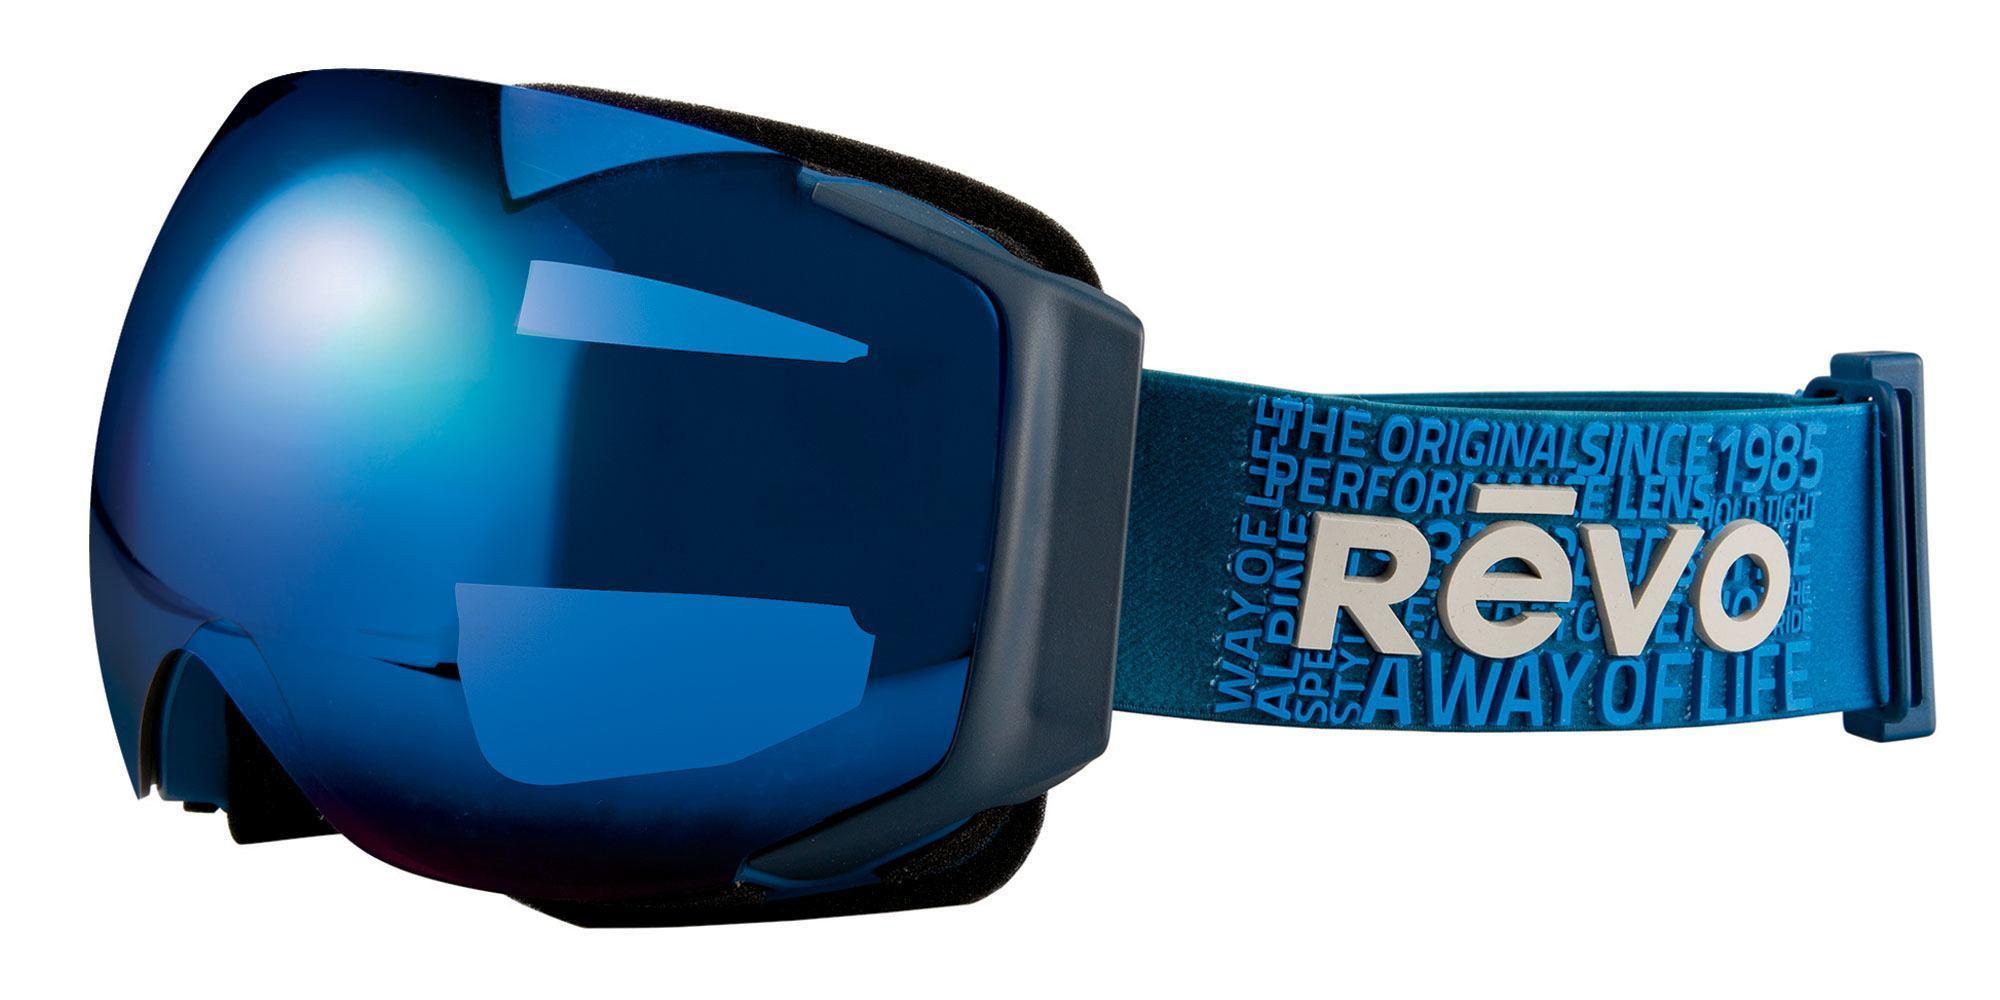 Revo Wordsmith Ski Goggles RG7008 at SelectSpecs